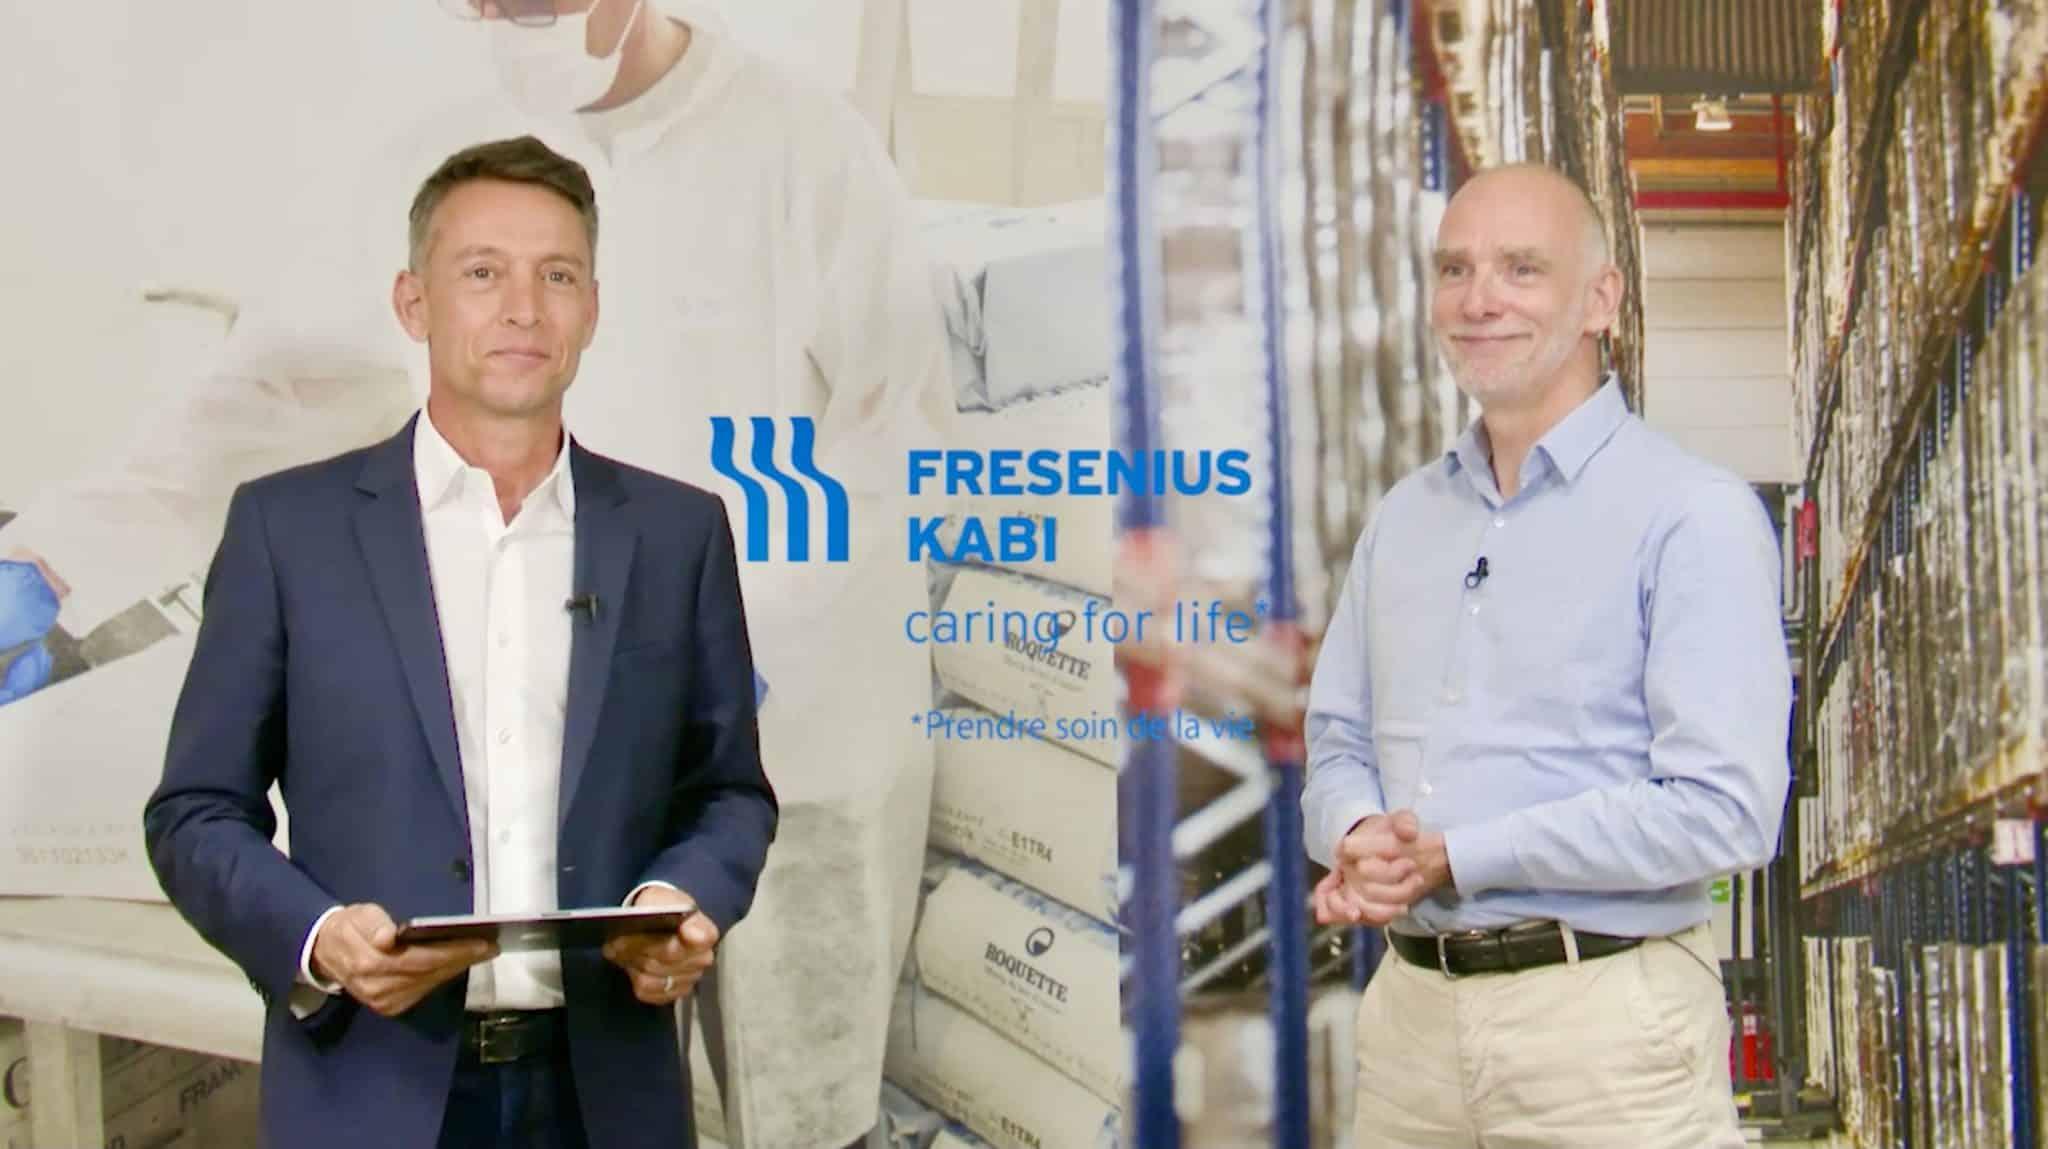 Présentation de Vidéo Corporate FRESENUIS KABI